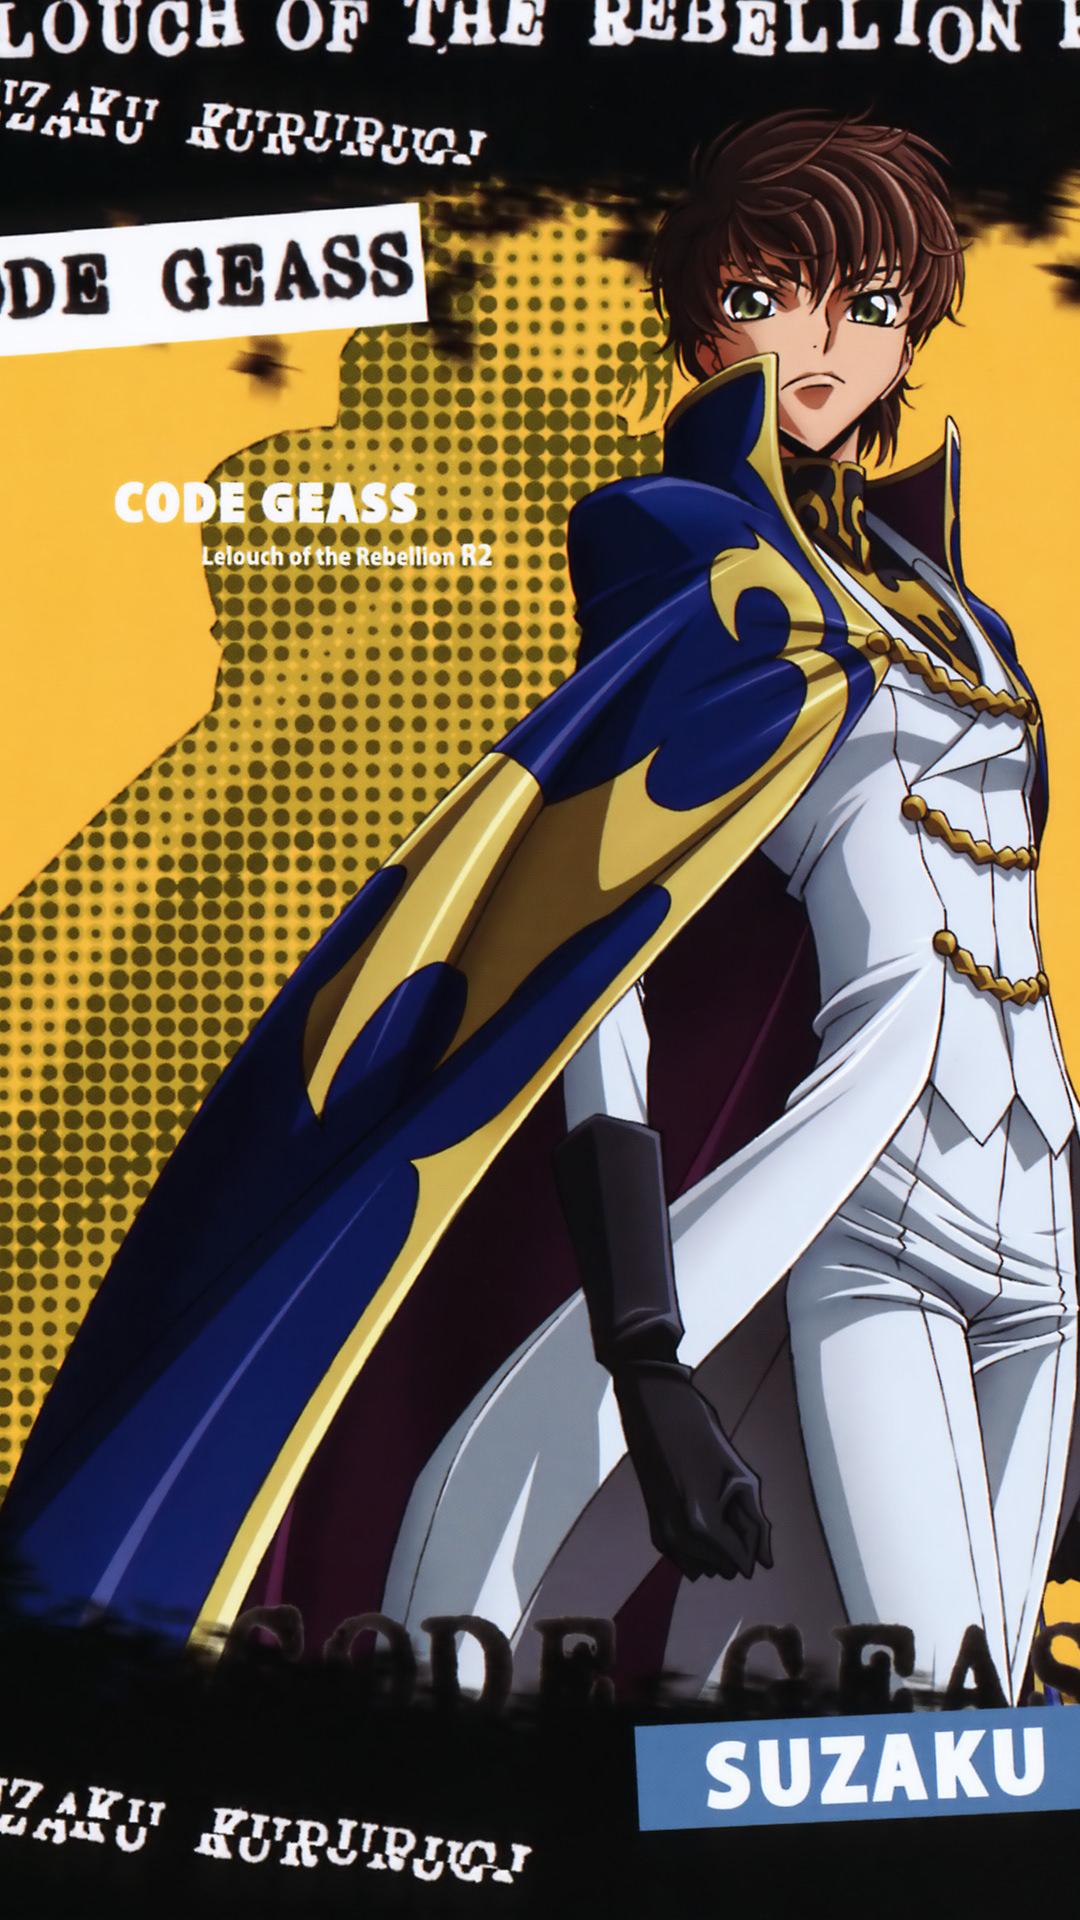 codegeass05